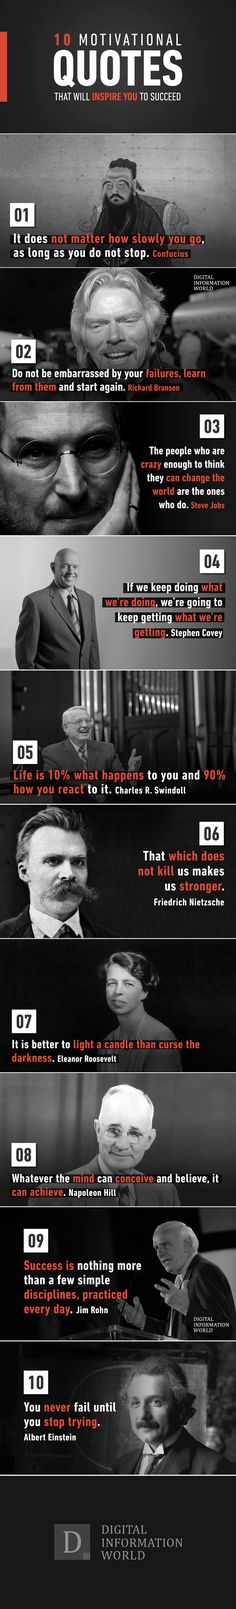 10 Motivational Quotes For Entrepreneurs